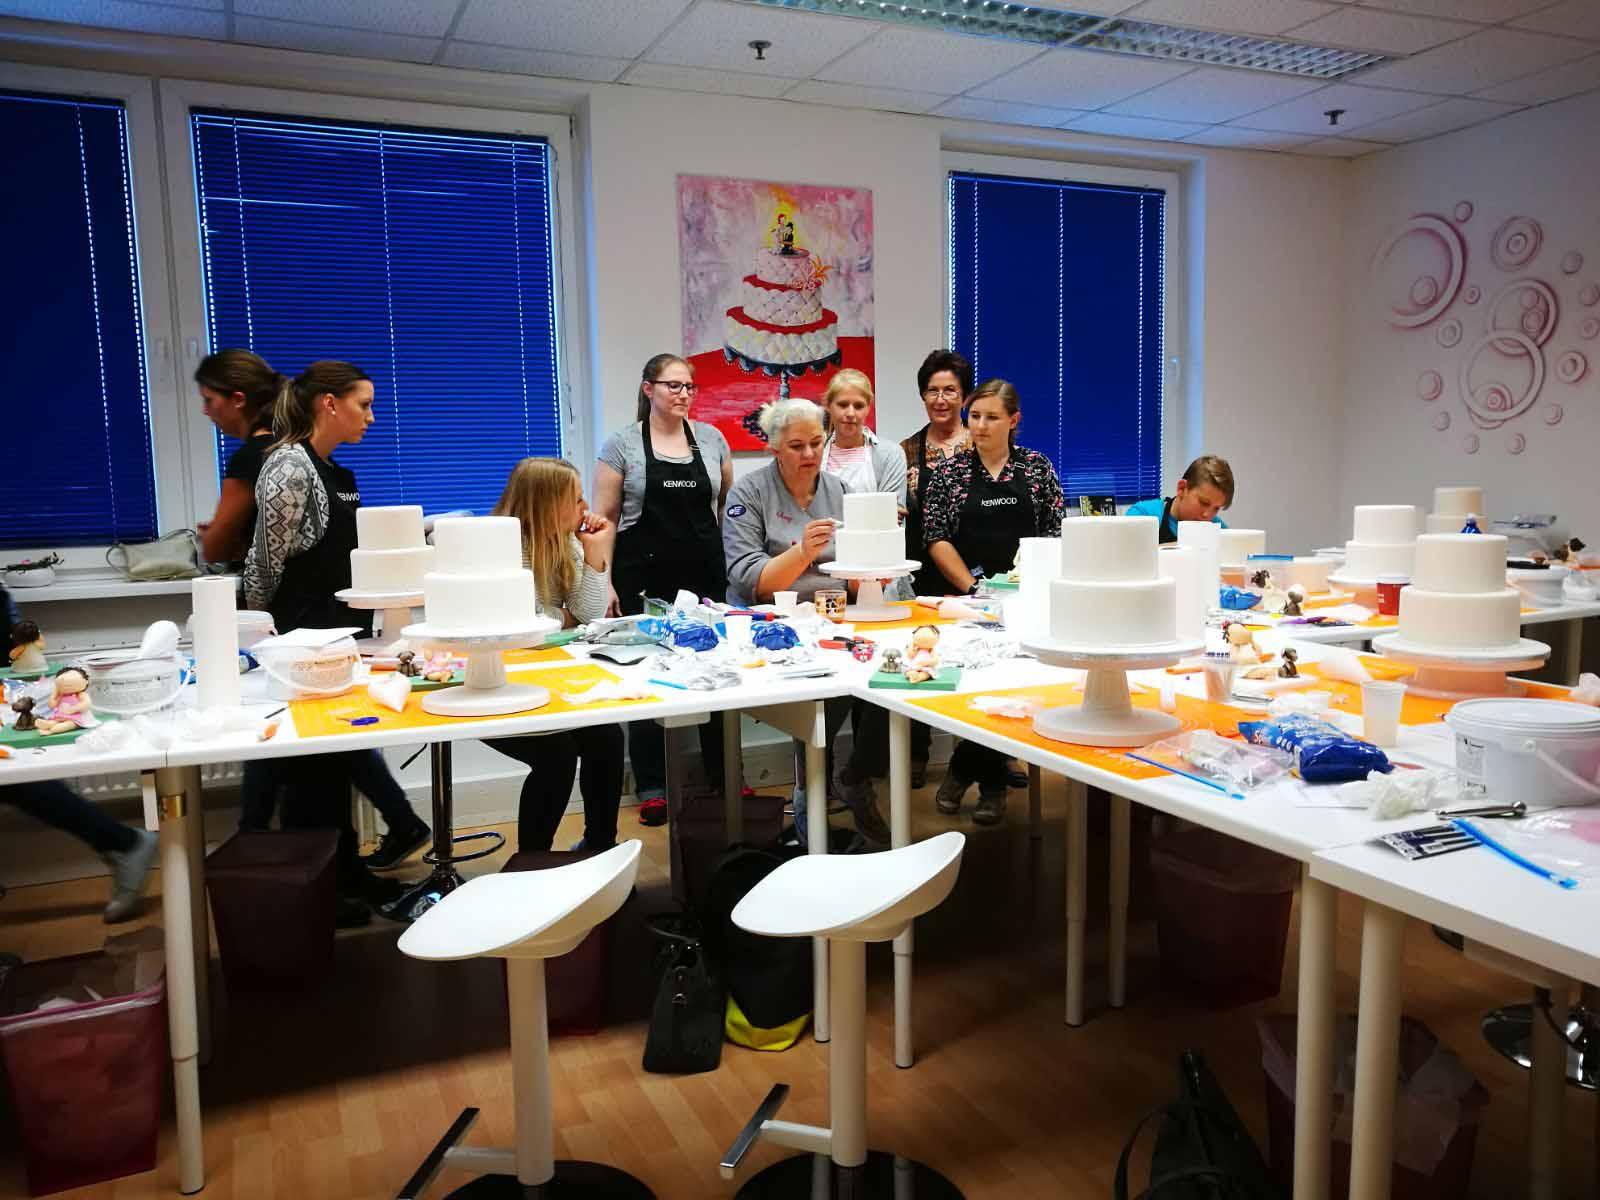 1. Kurs bei Cake Decor & More in Wien im Oktober 2017